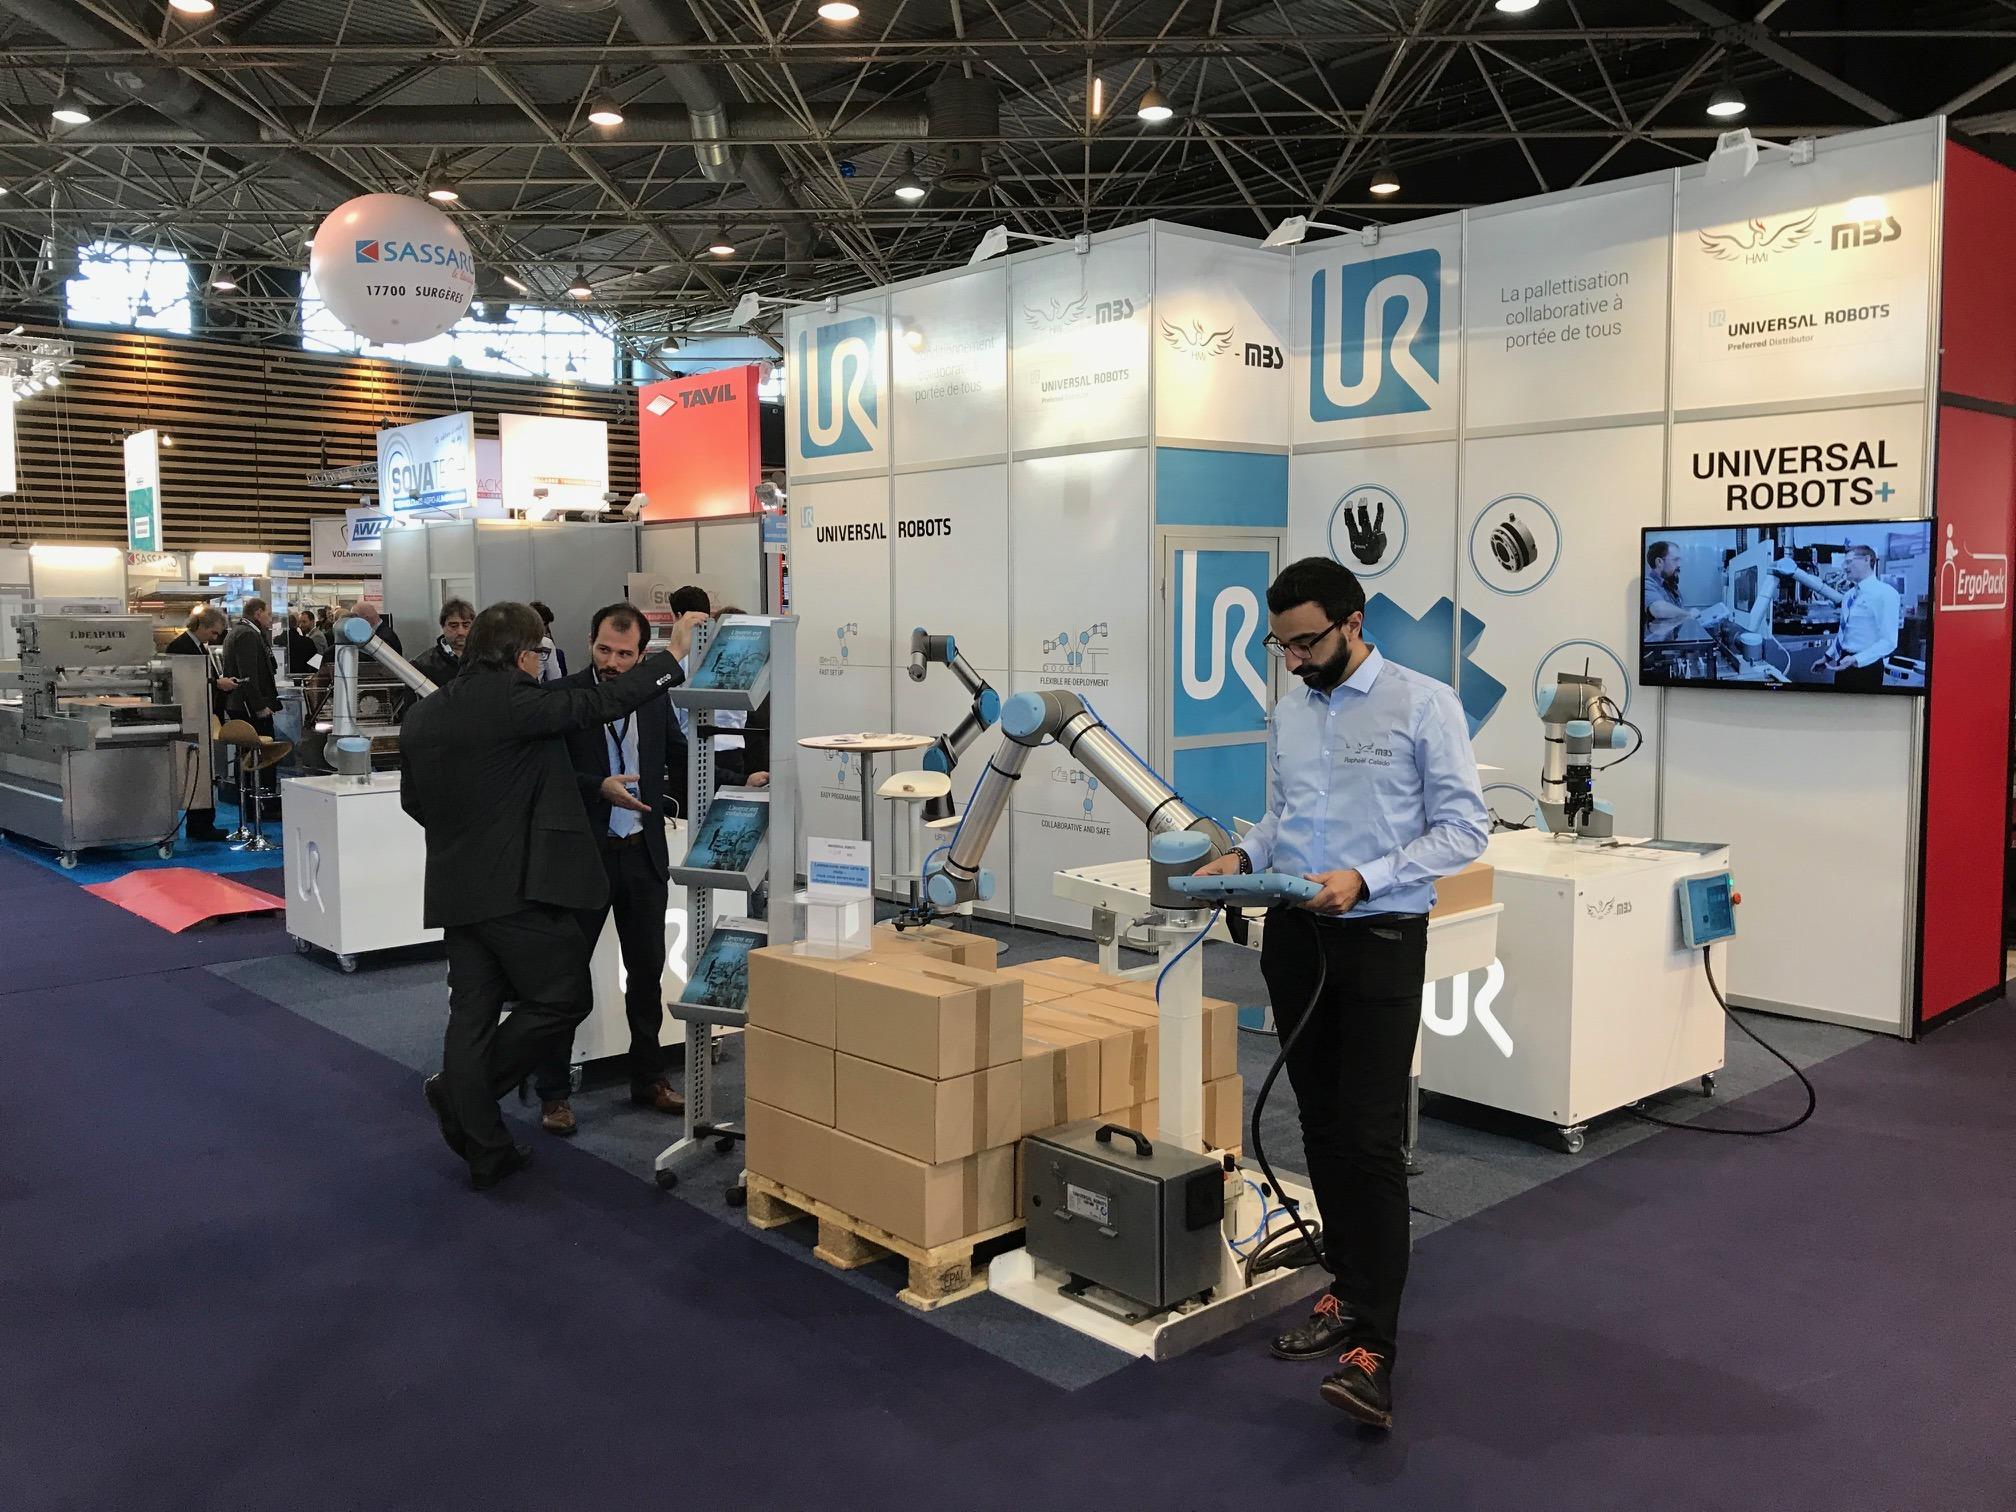 EUROPACK EUROMANUT UNIVERSAL ROBOTS HMI MBS COBOT ROBOT COLLABORATIF UR3 UR5 UR10